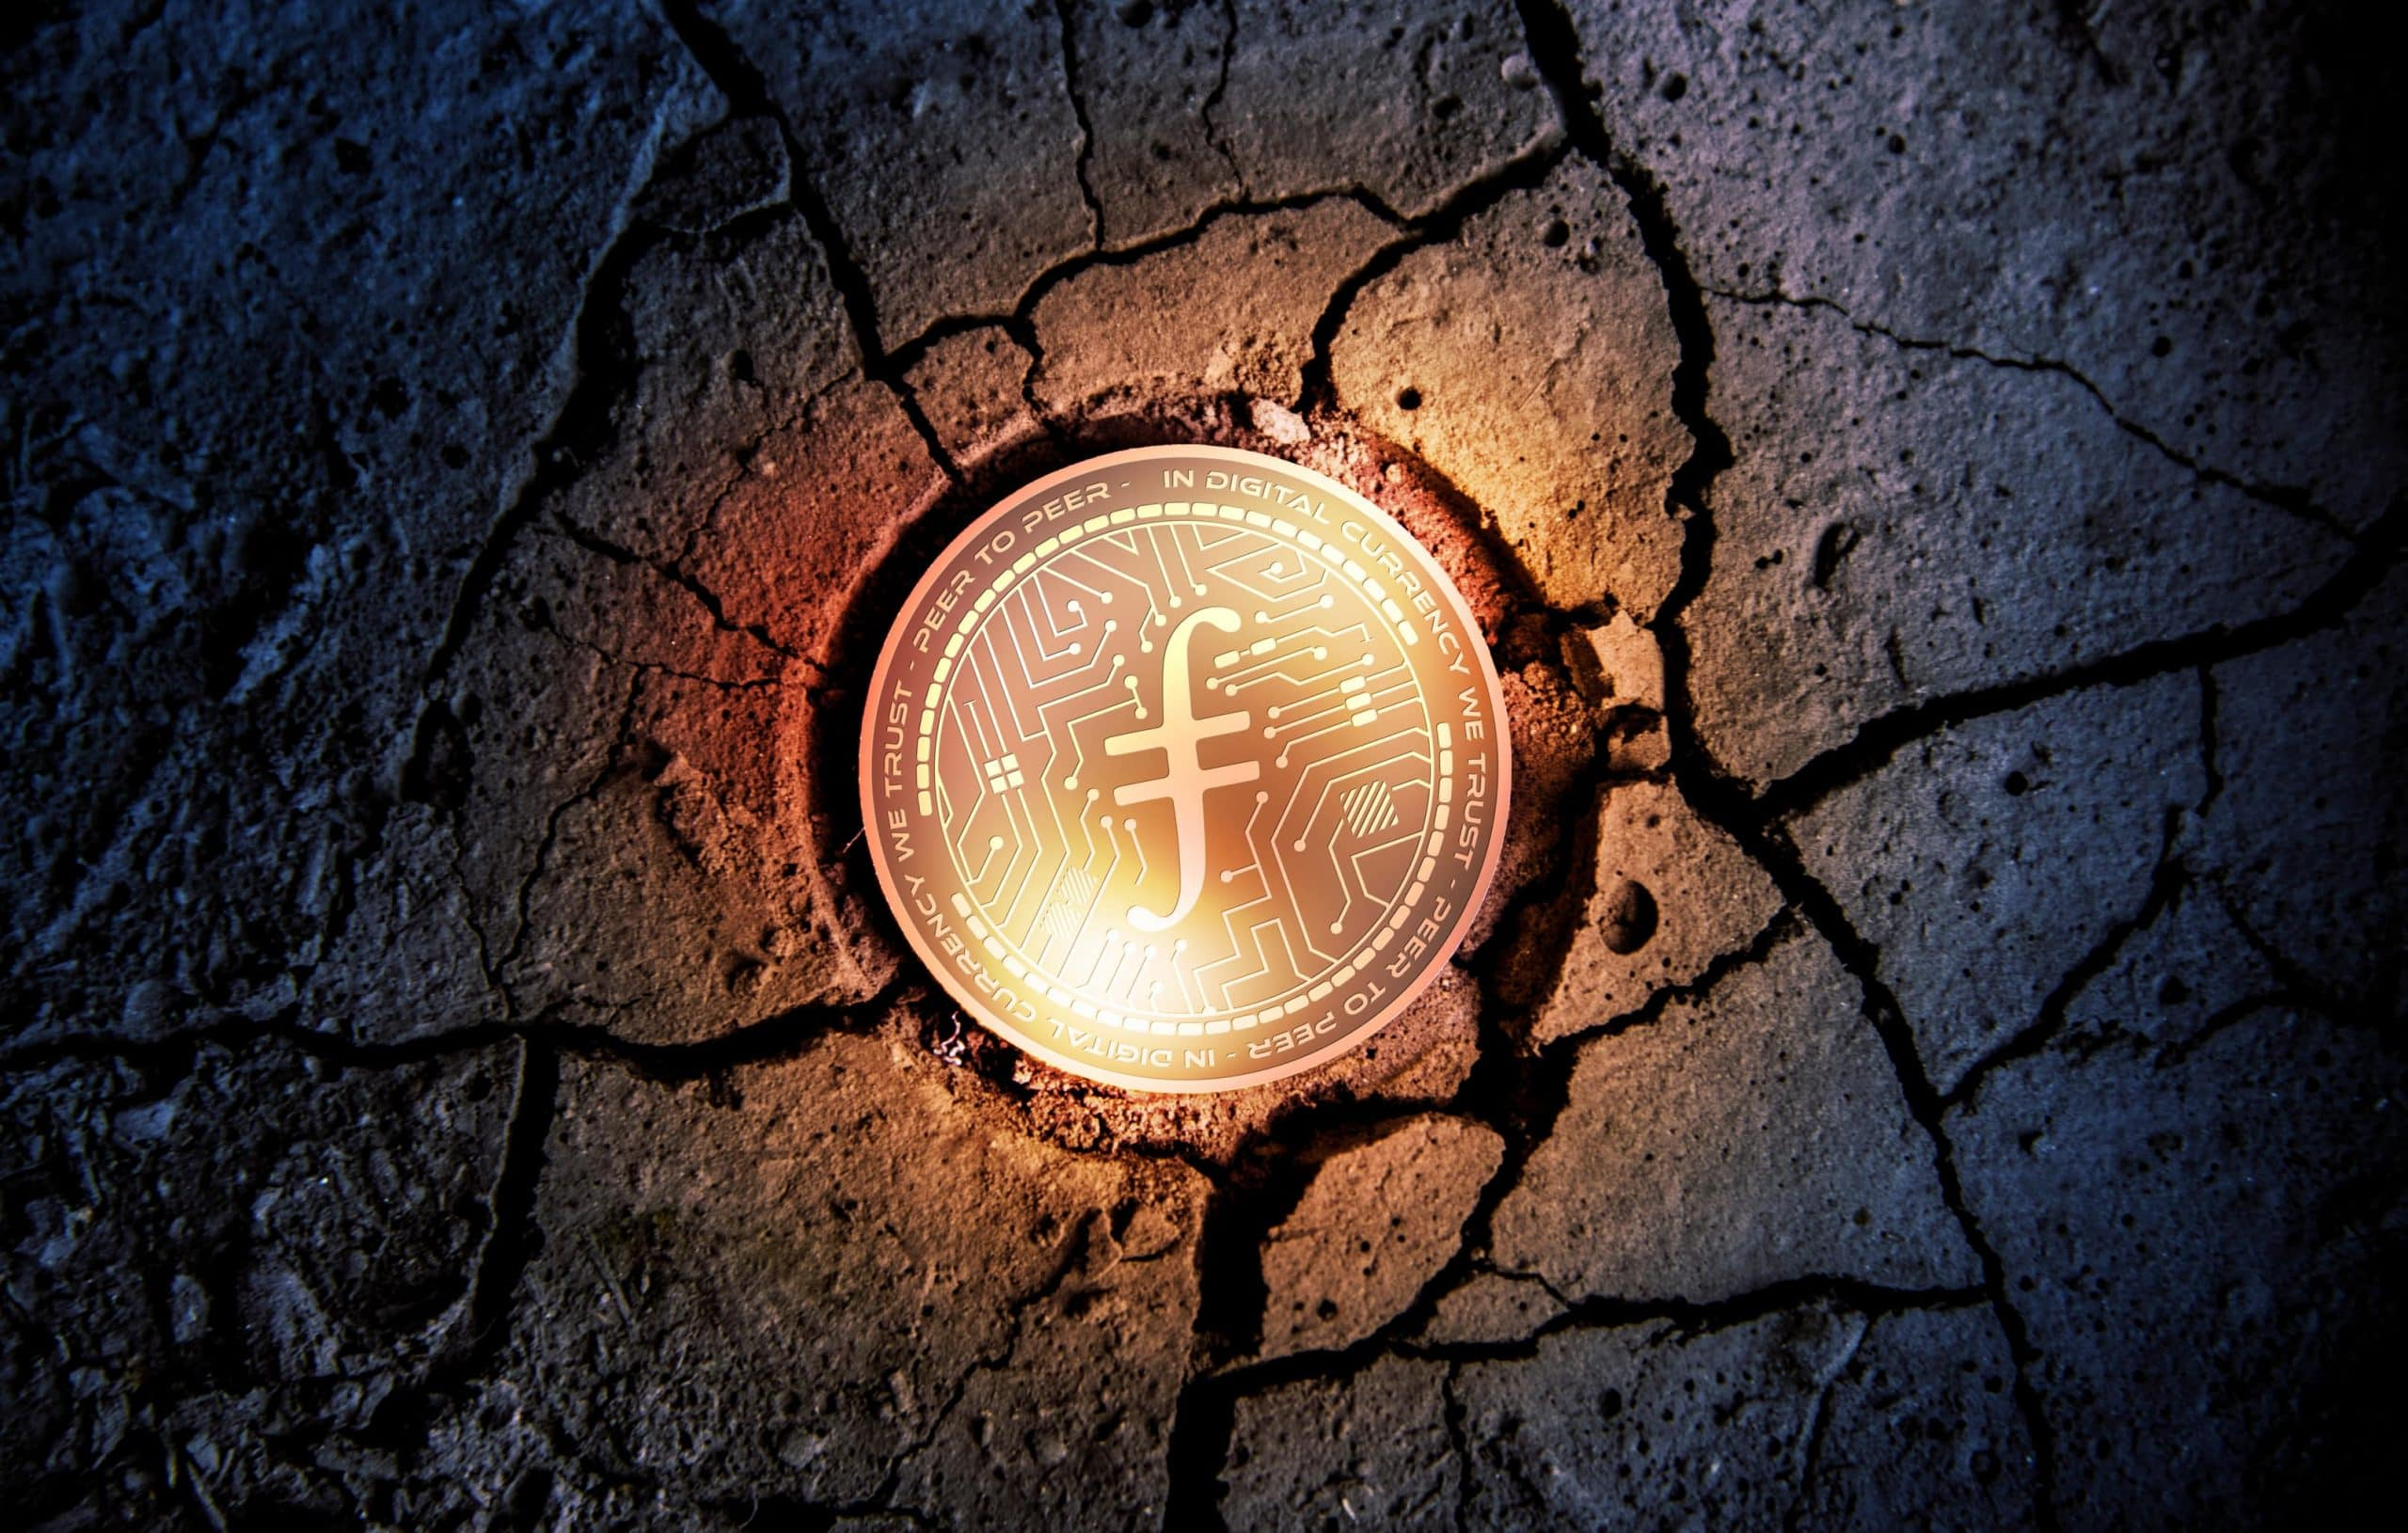 Fielcoin Münze umgeben von gesprengtem Asphalt